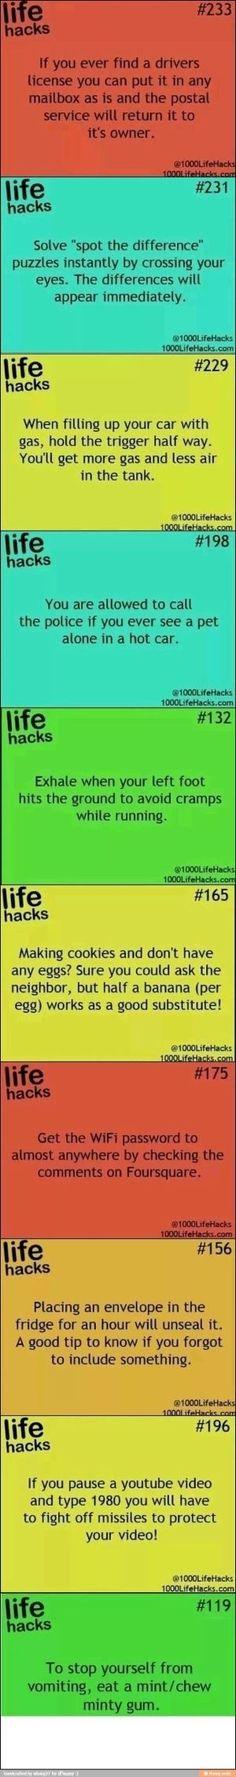 Life Hacks 2!